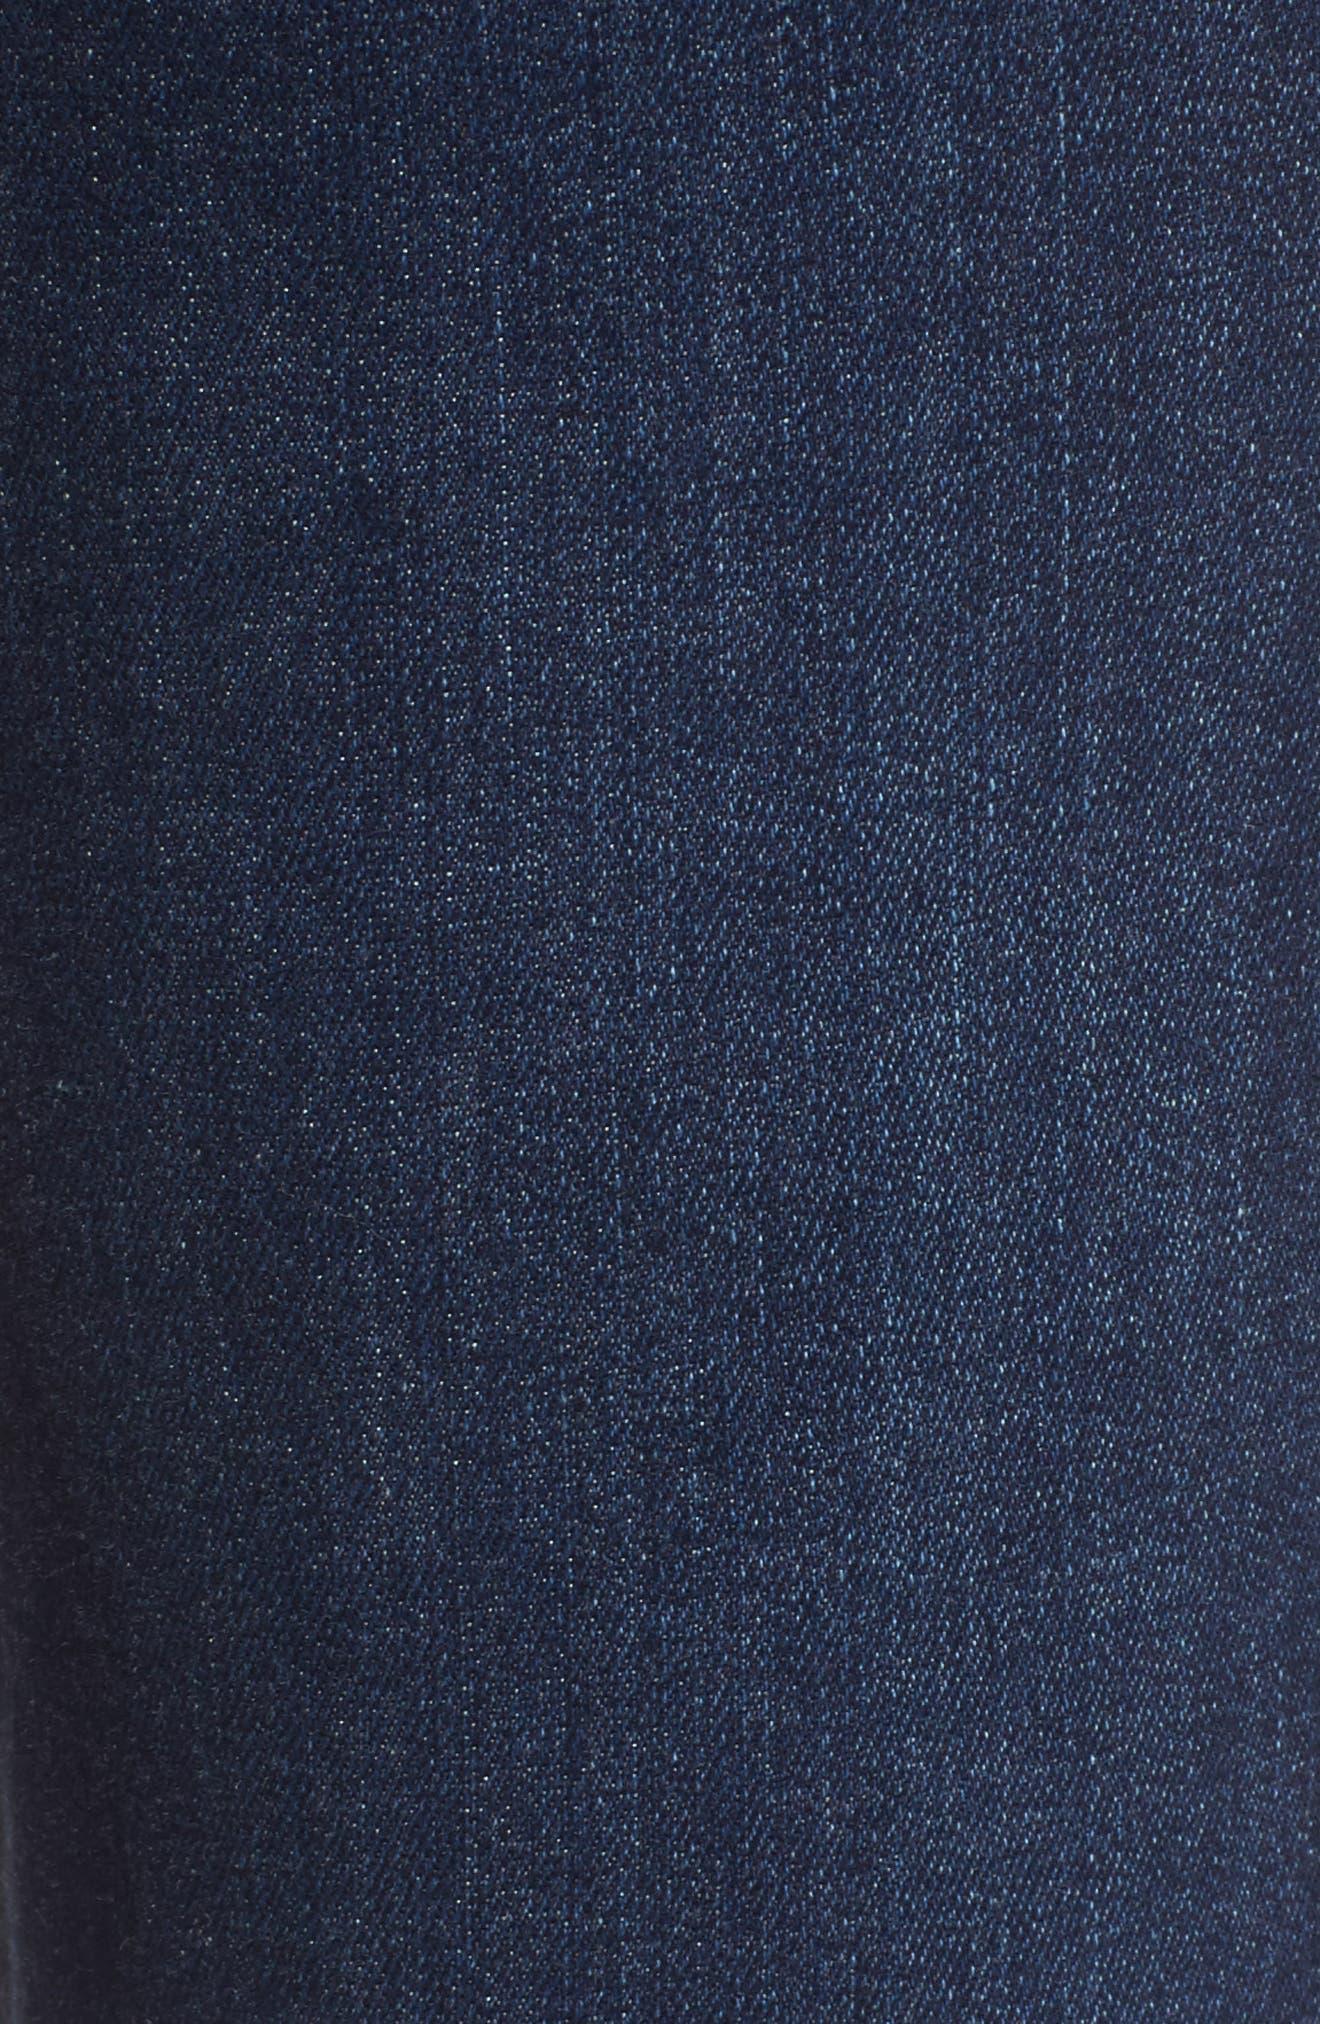 Margot High Waist Ankle Skinny Jeans,                             Alternate thumbnail 5, color,                             Davidson Destructed